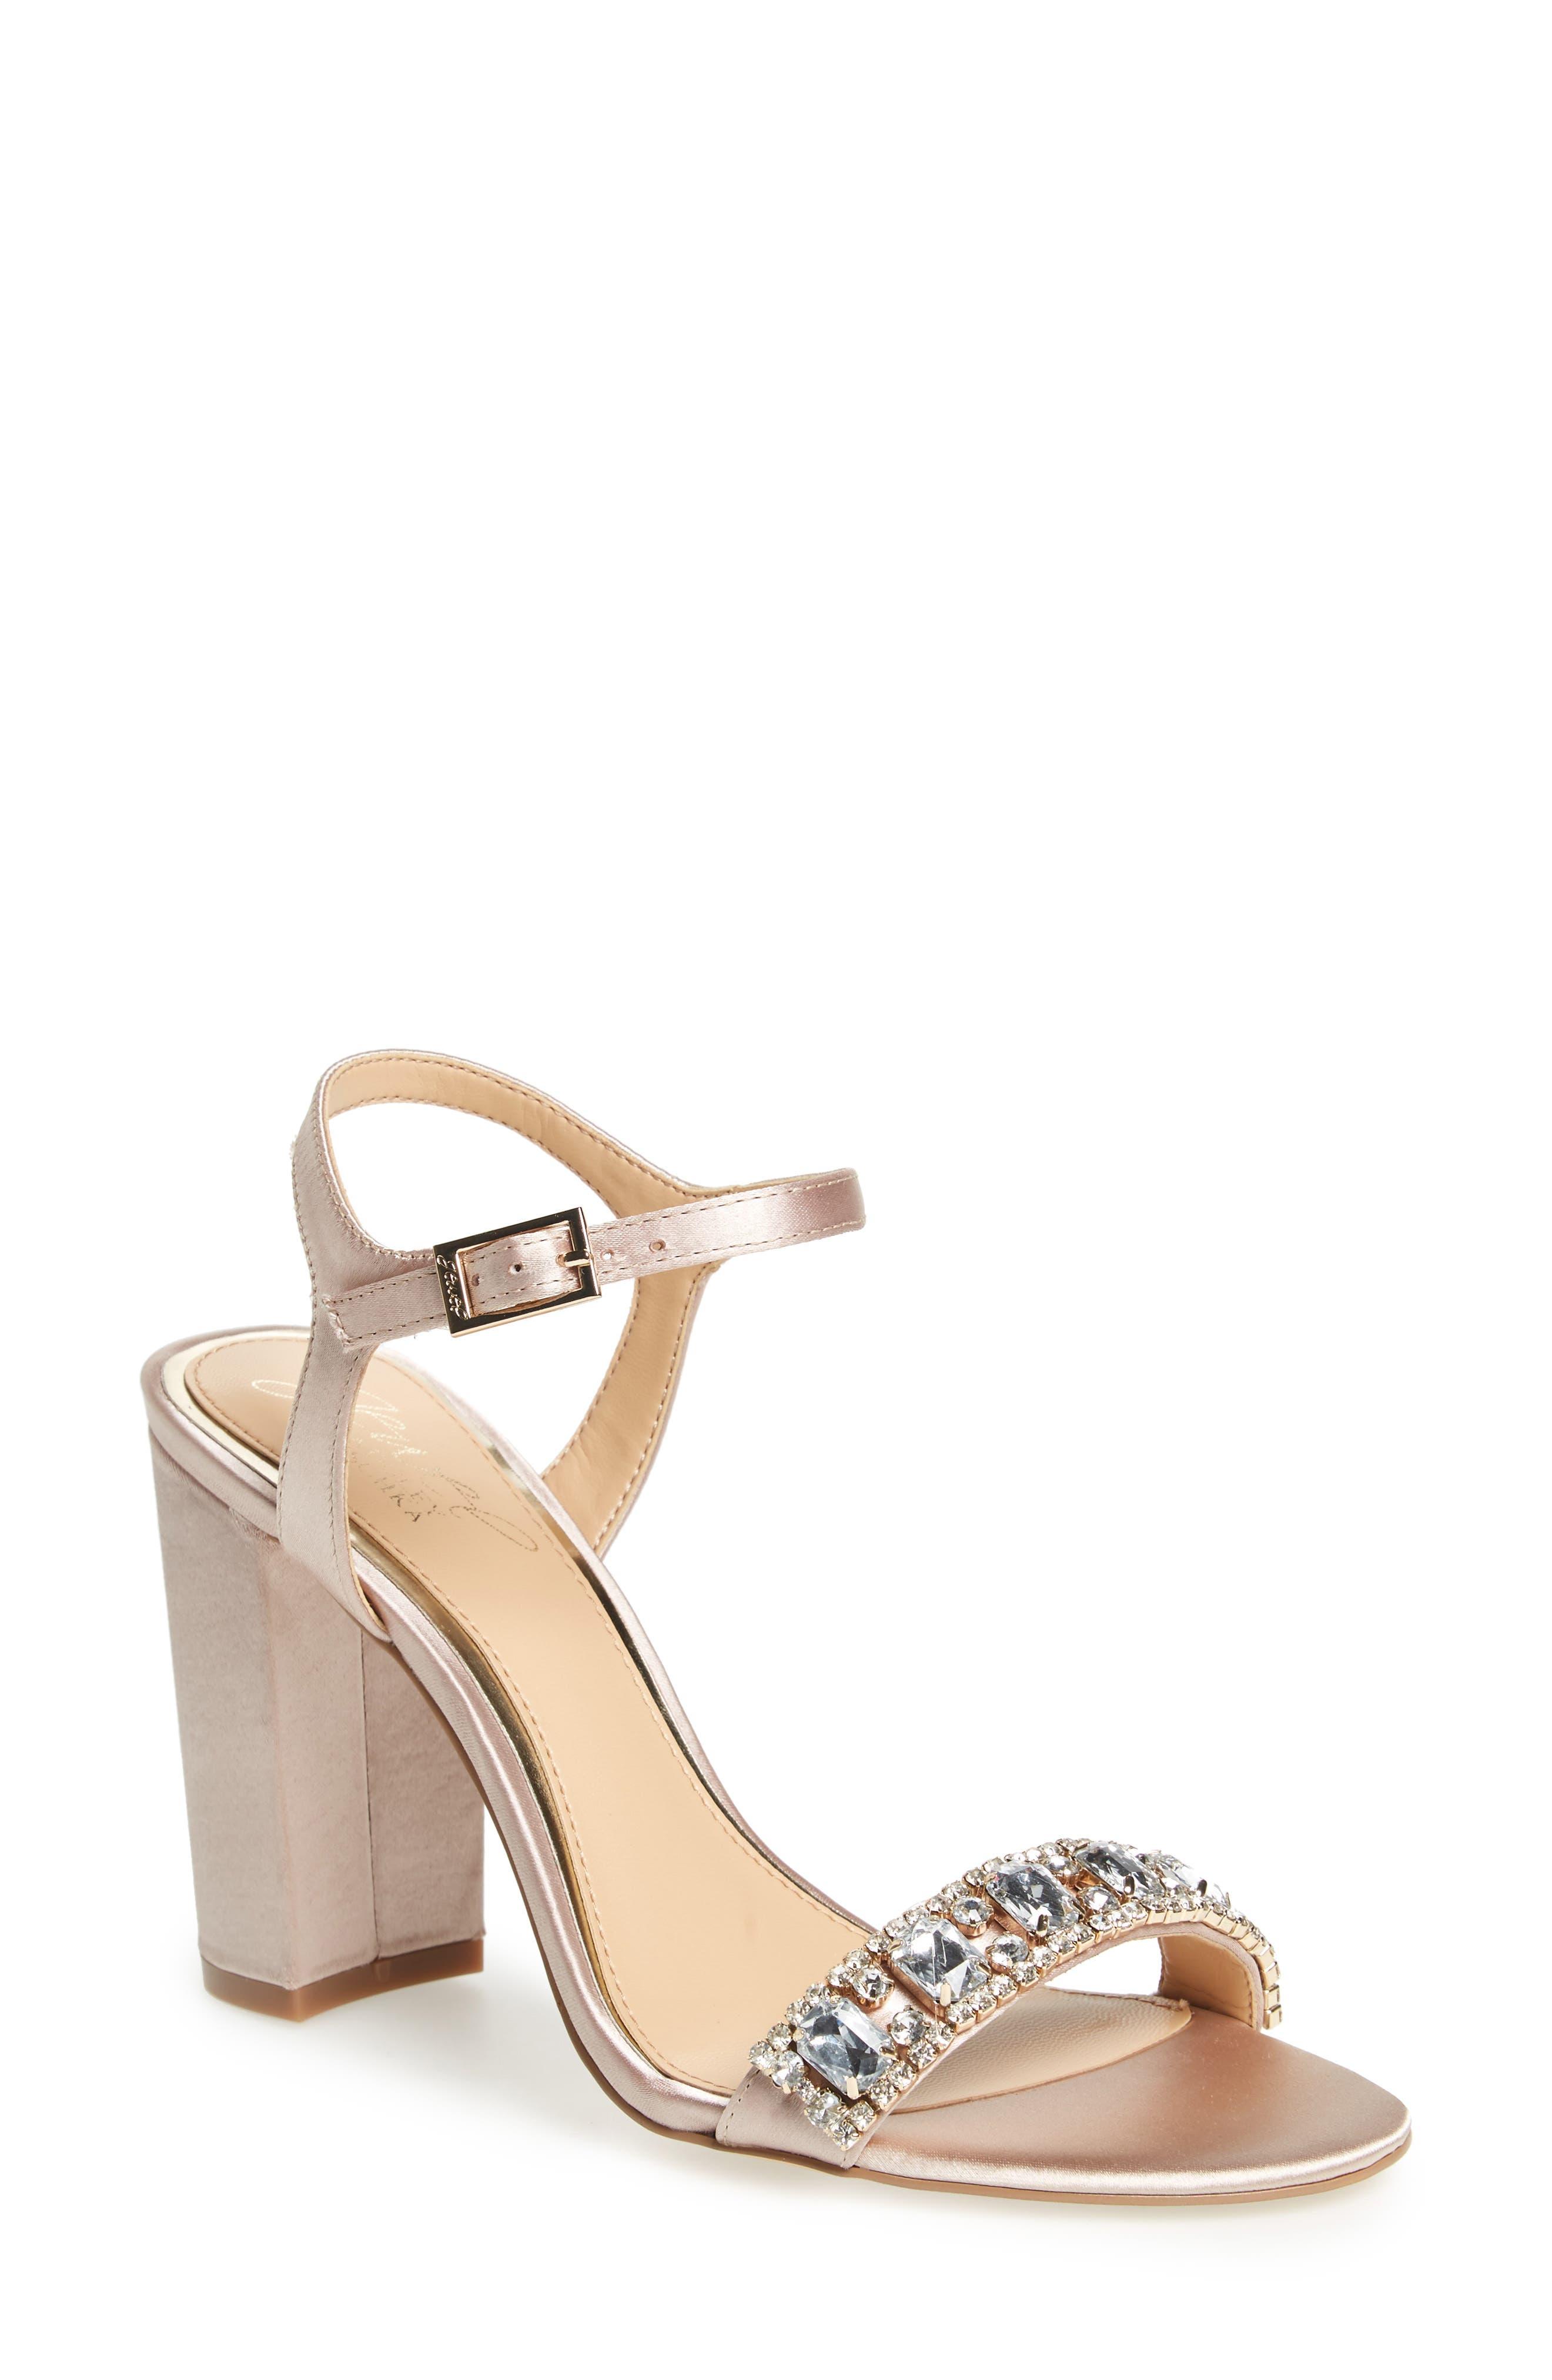 Jewel Badgley Mischka Hendricks Embellished Block Heel Sandal (Women)